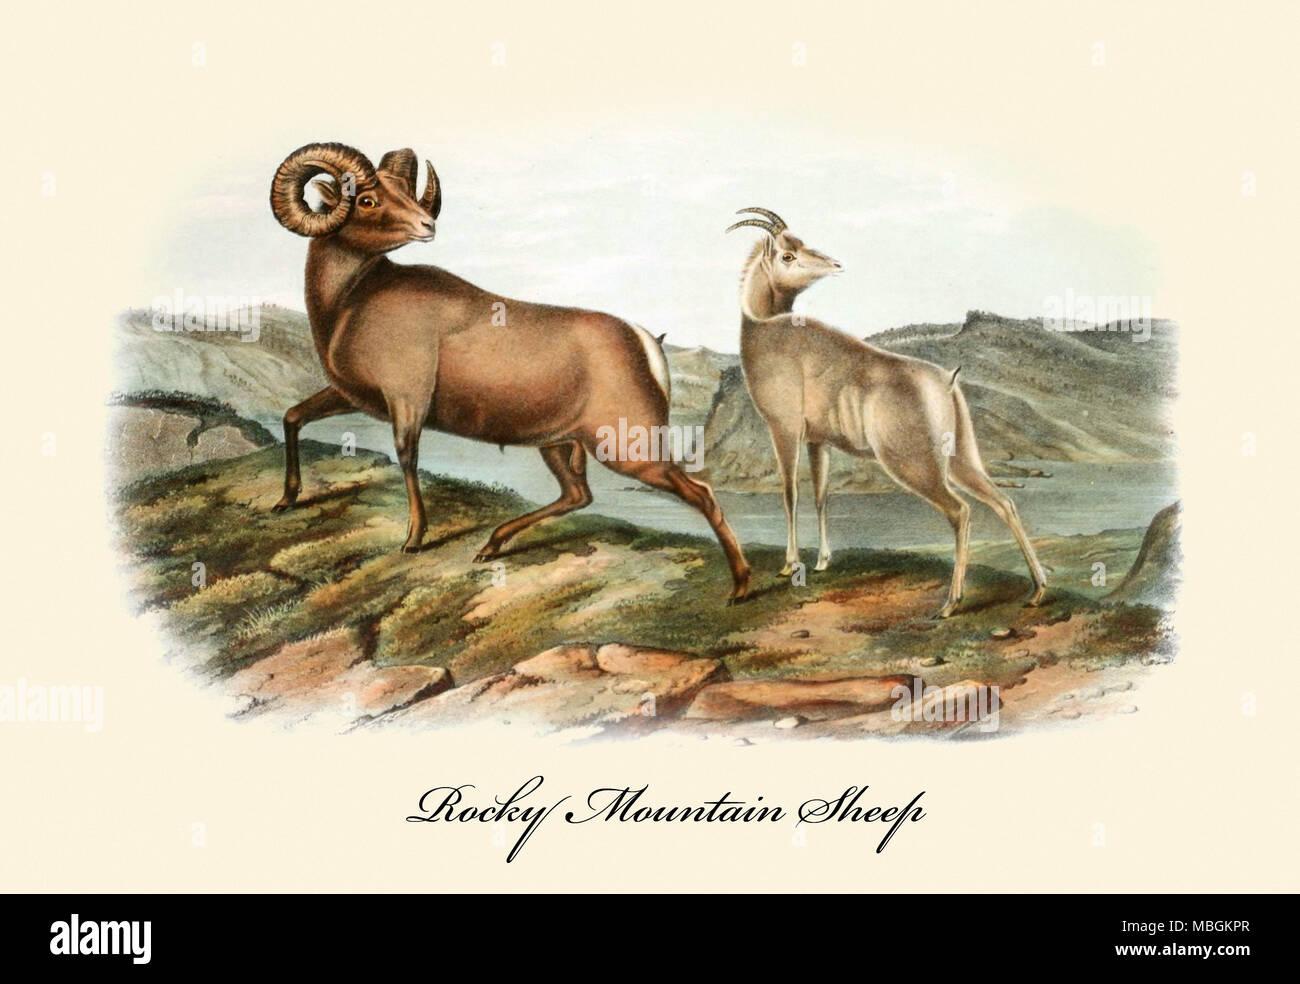 Rocky Mountain ovini Immagini Stock